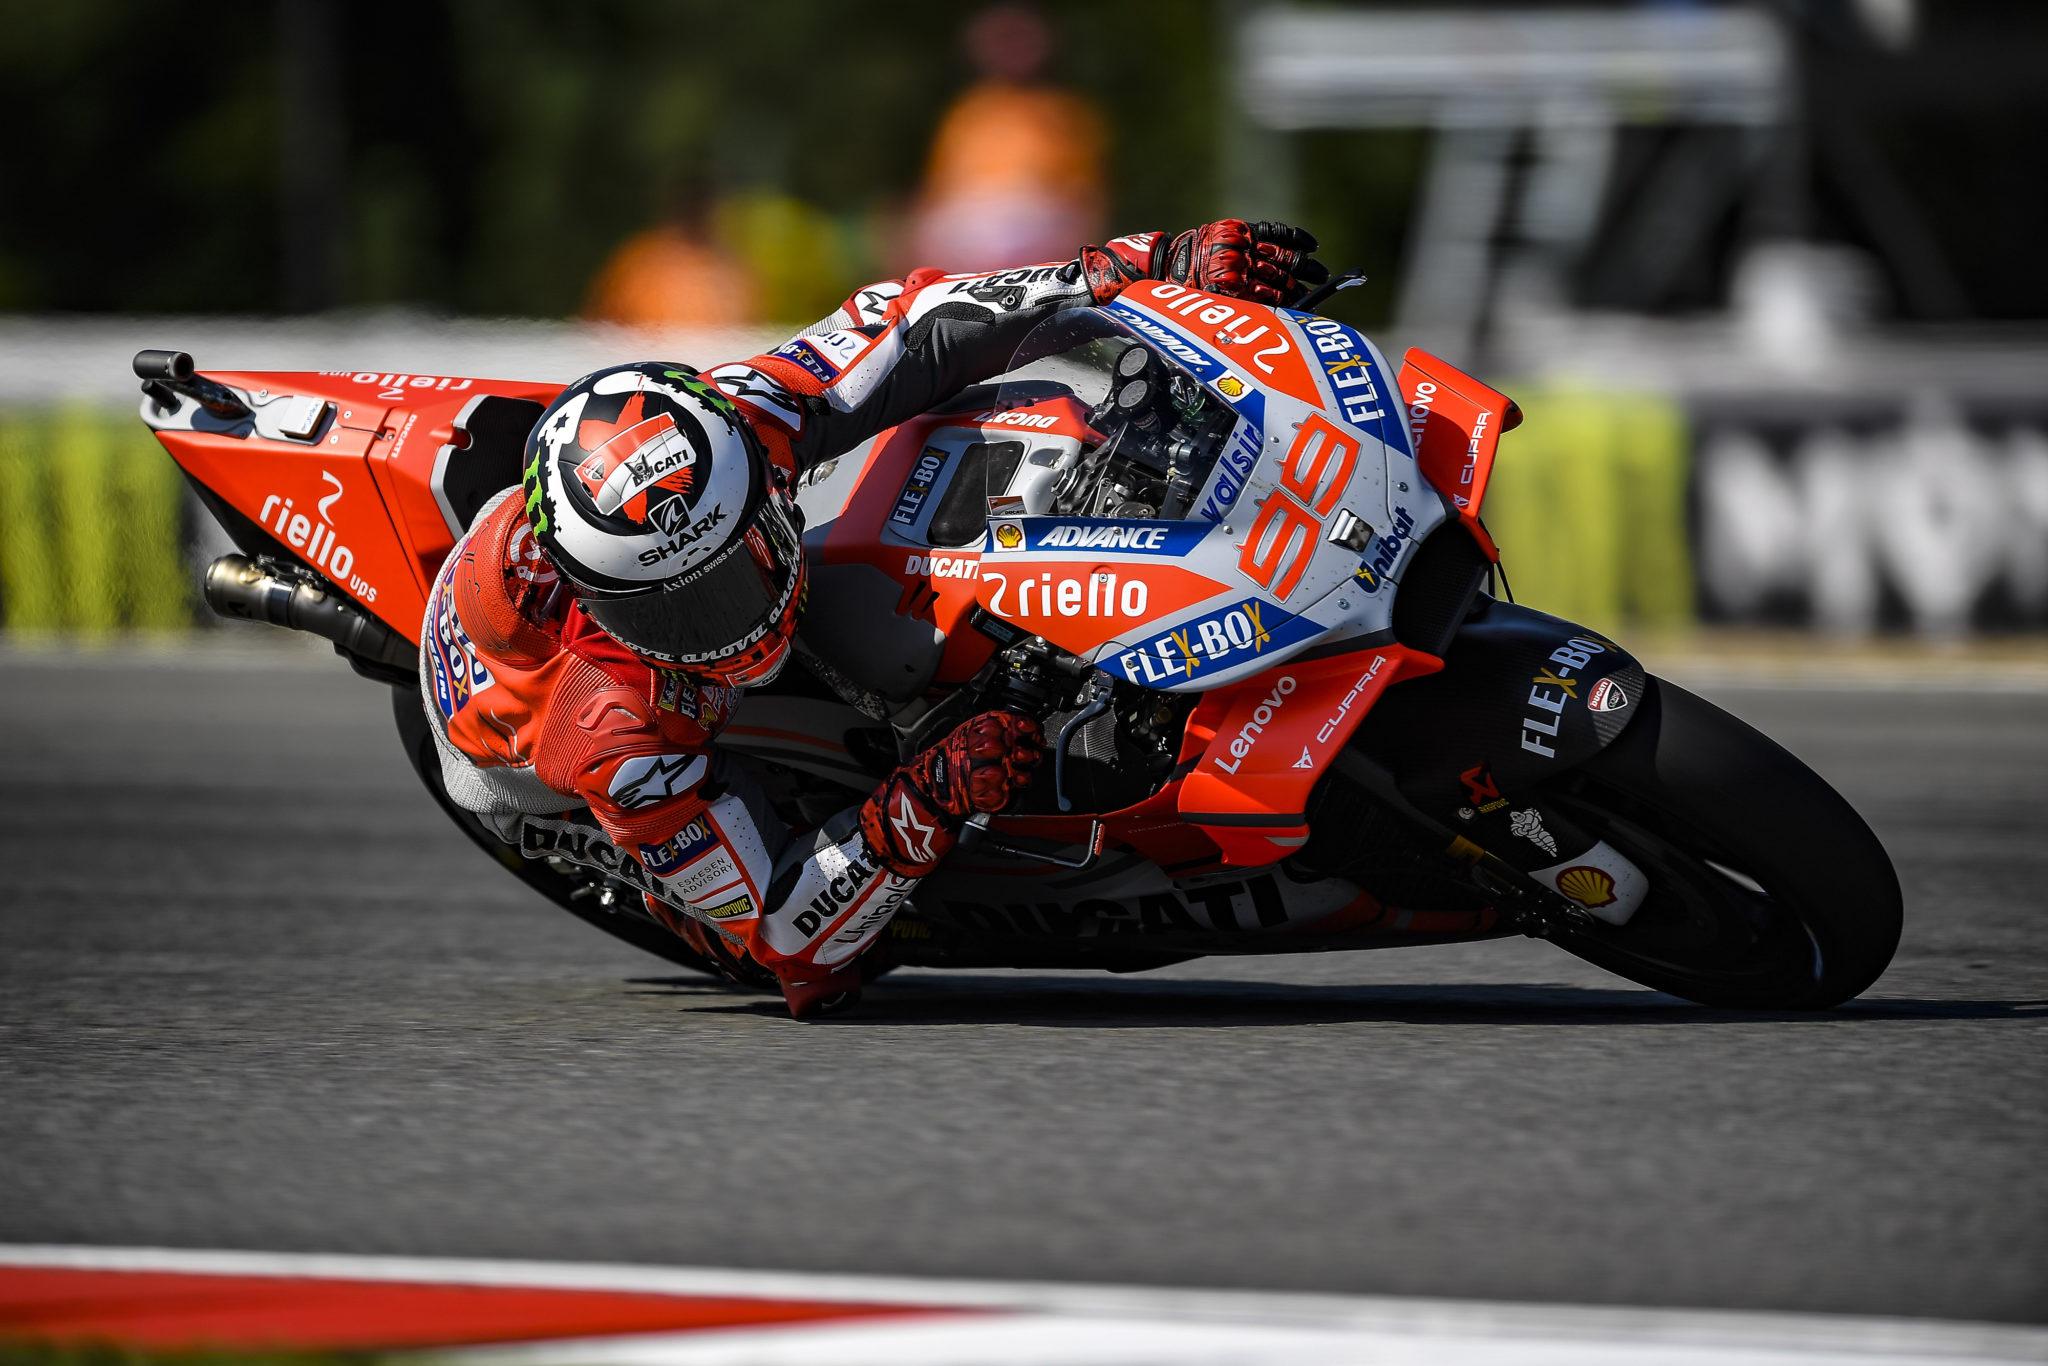 Visor Hjc Rpha10 Plus Lorenzo Green Mamba Fullface Kaca Helm Stiker Desain Rpha Motogp Ducati Allows To Test With Honda